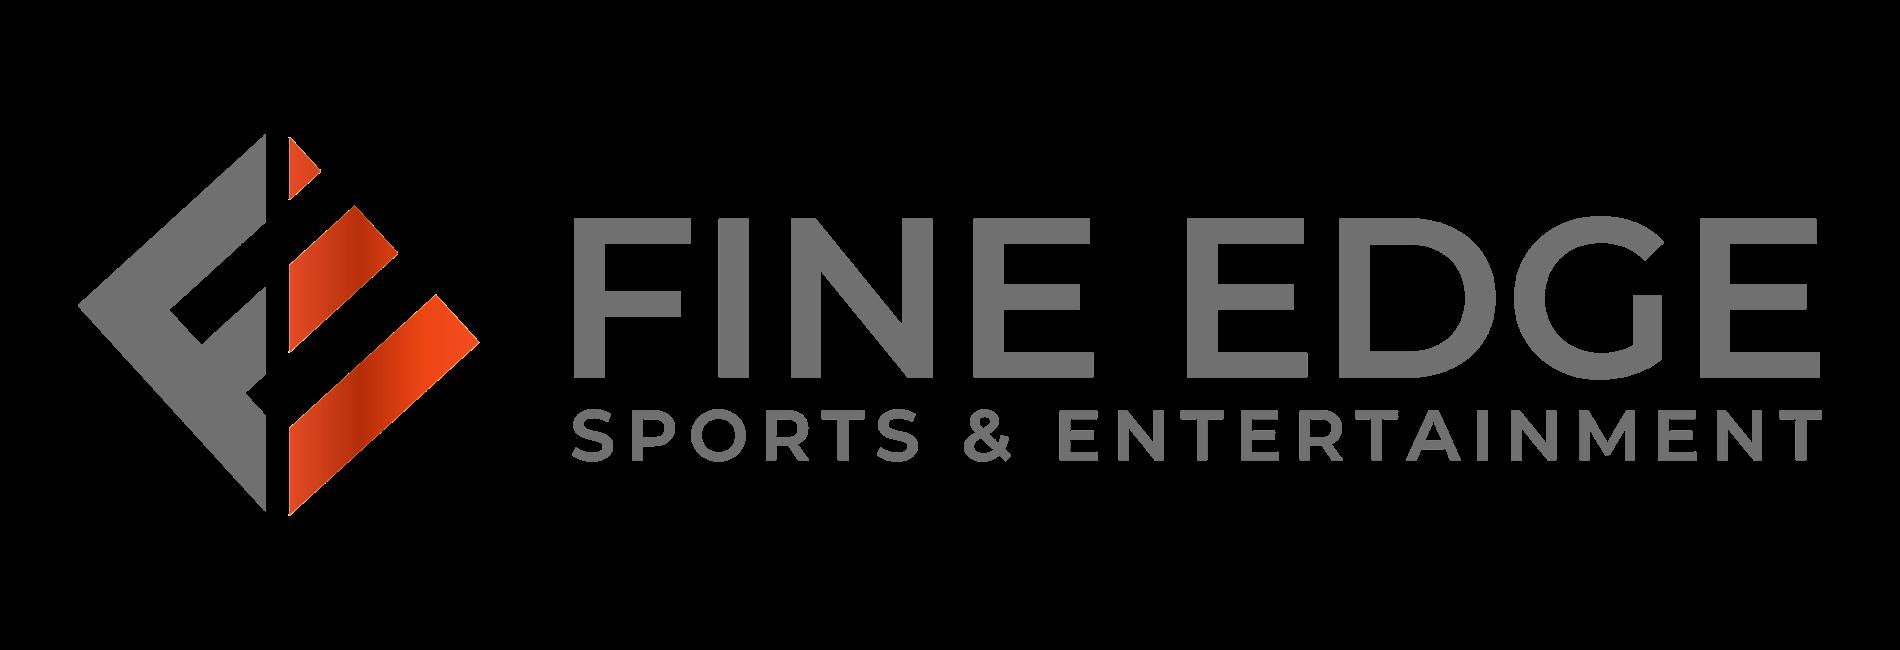 Fine Edge Sports